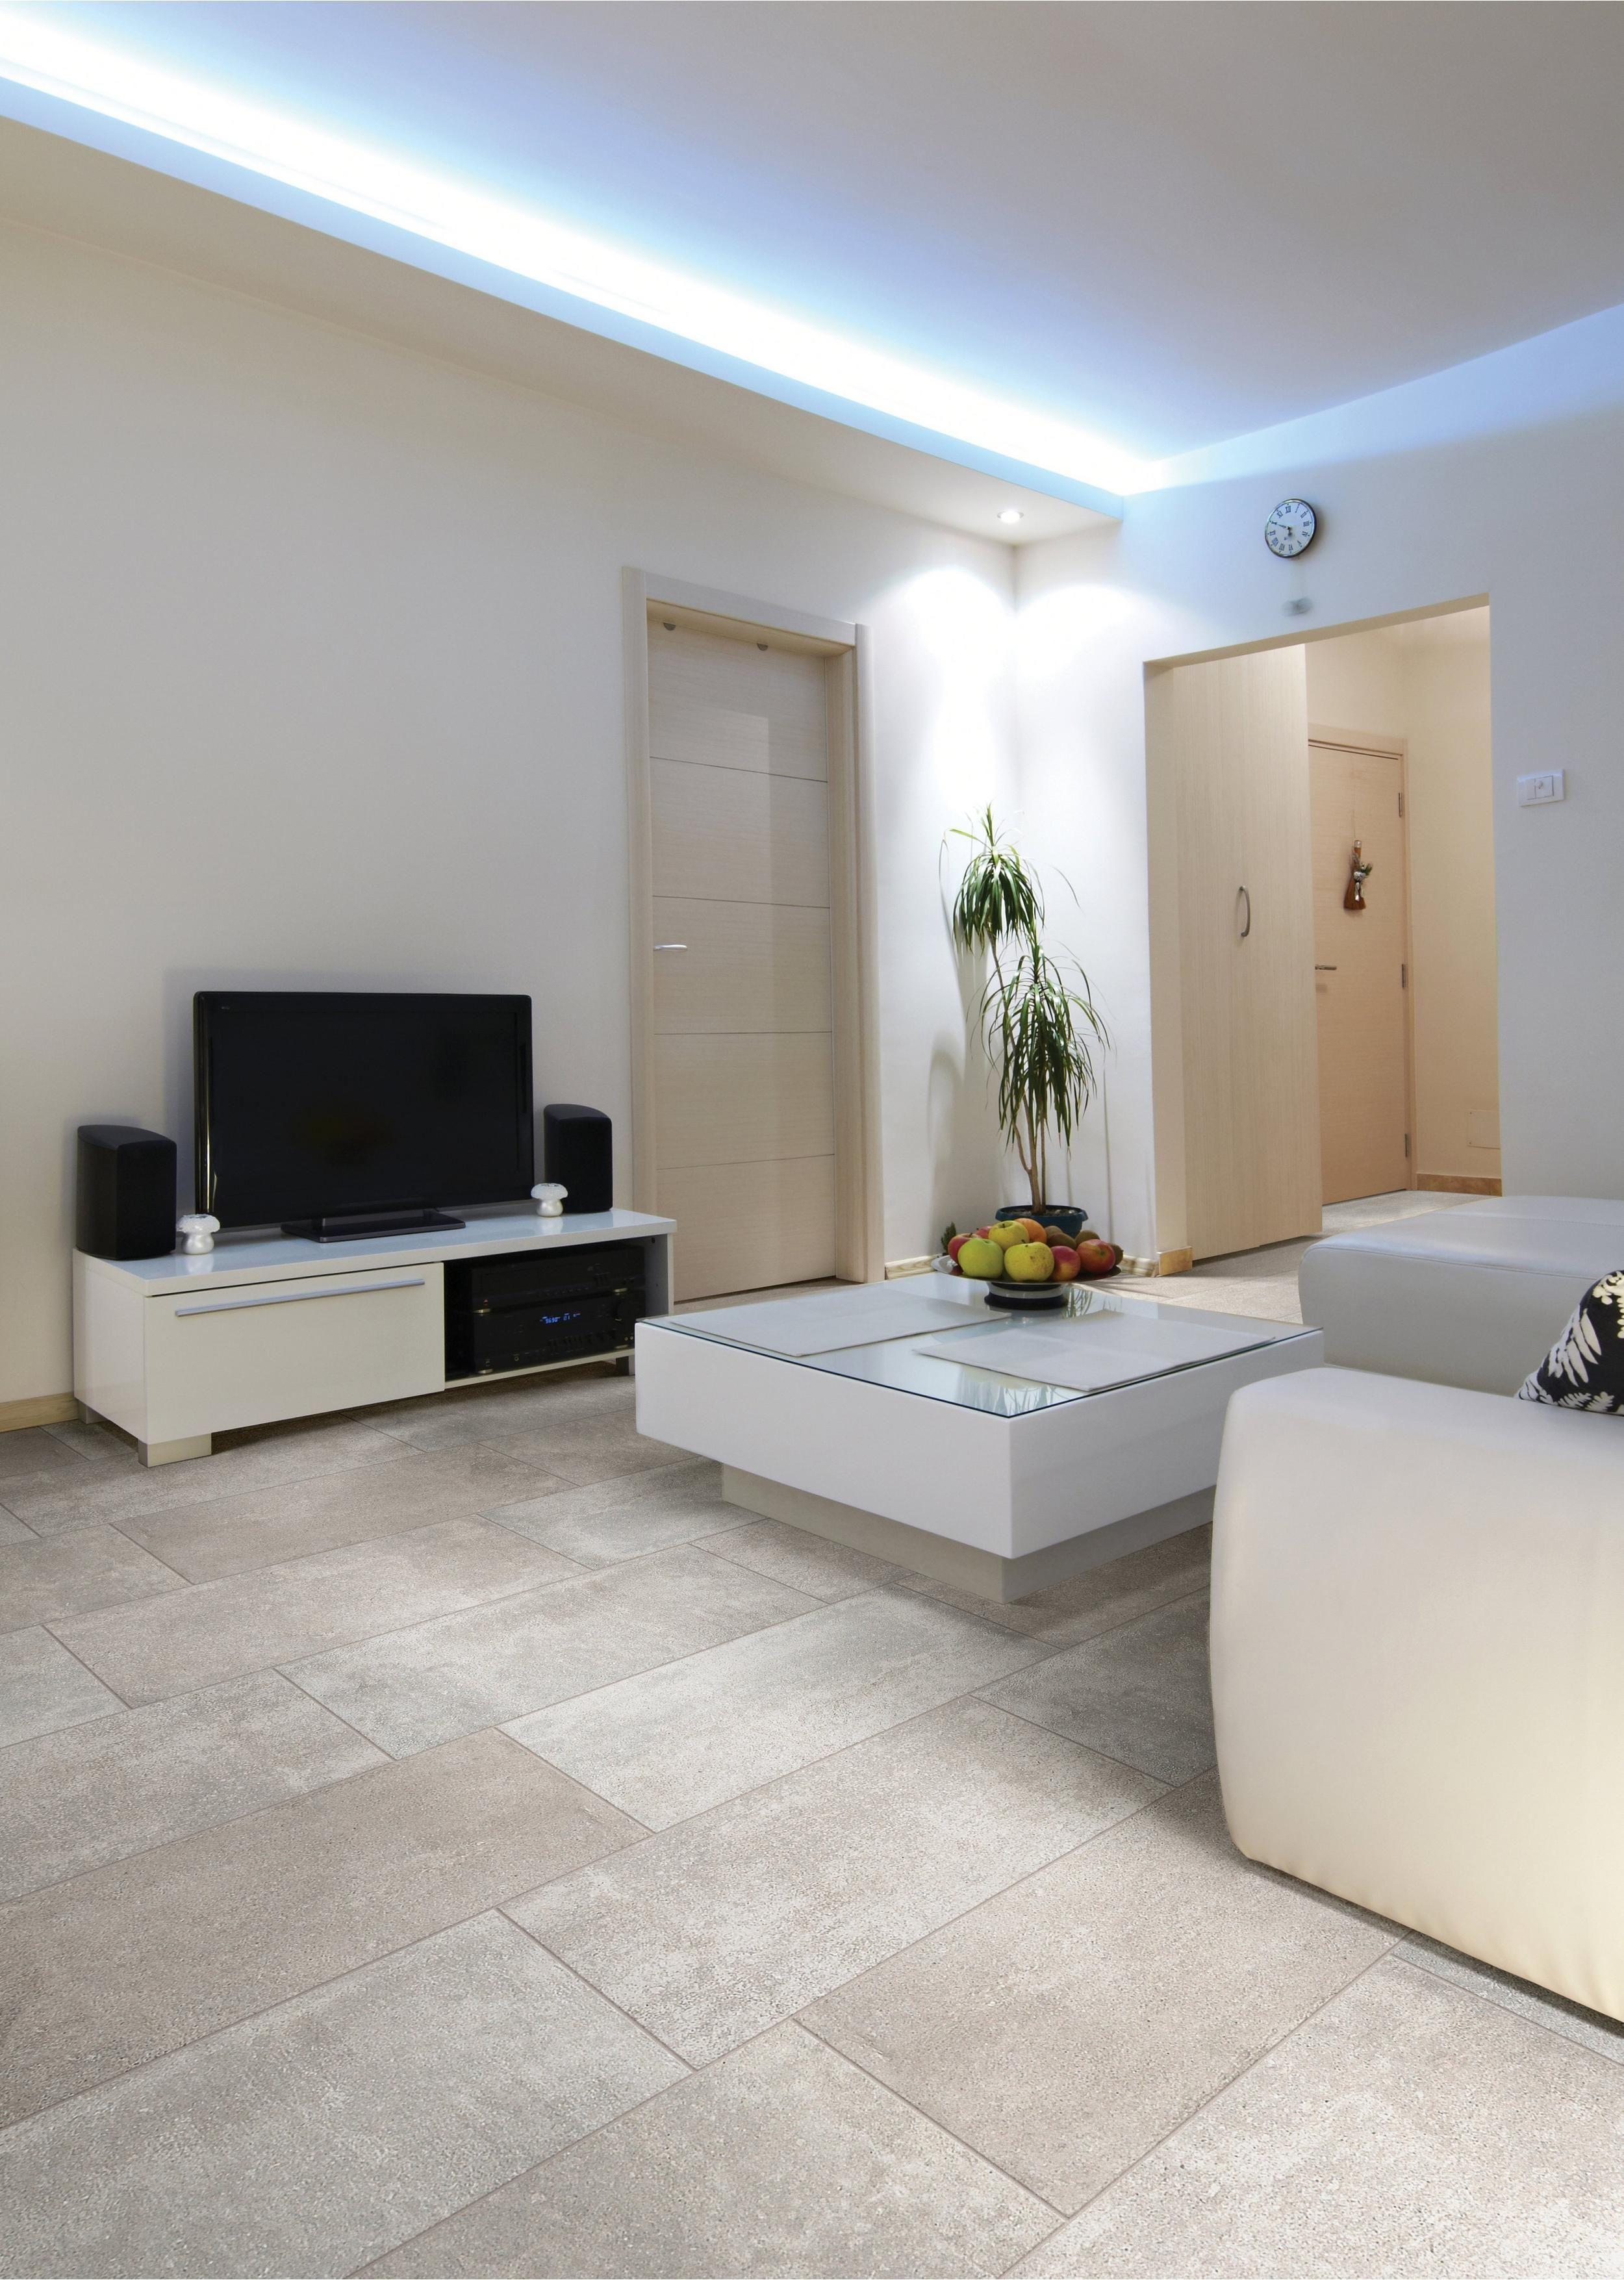 Vogue Warm Gray Porcelain Tile Porcelain Tile Floor Decor Living Room Tiles Tile Floor Living Room Gray Porcelain Tile